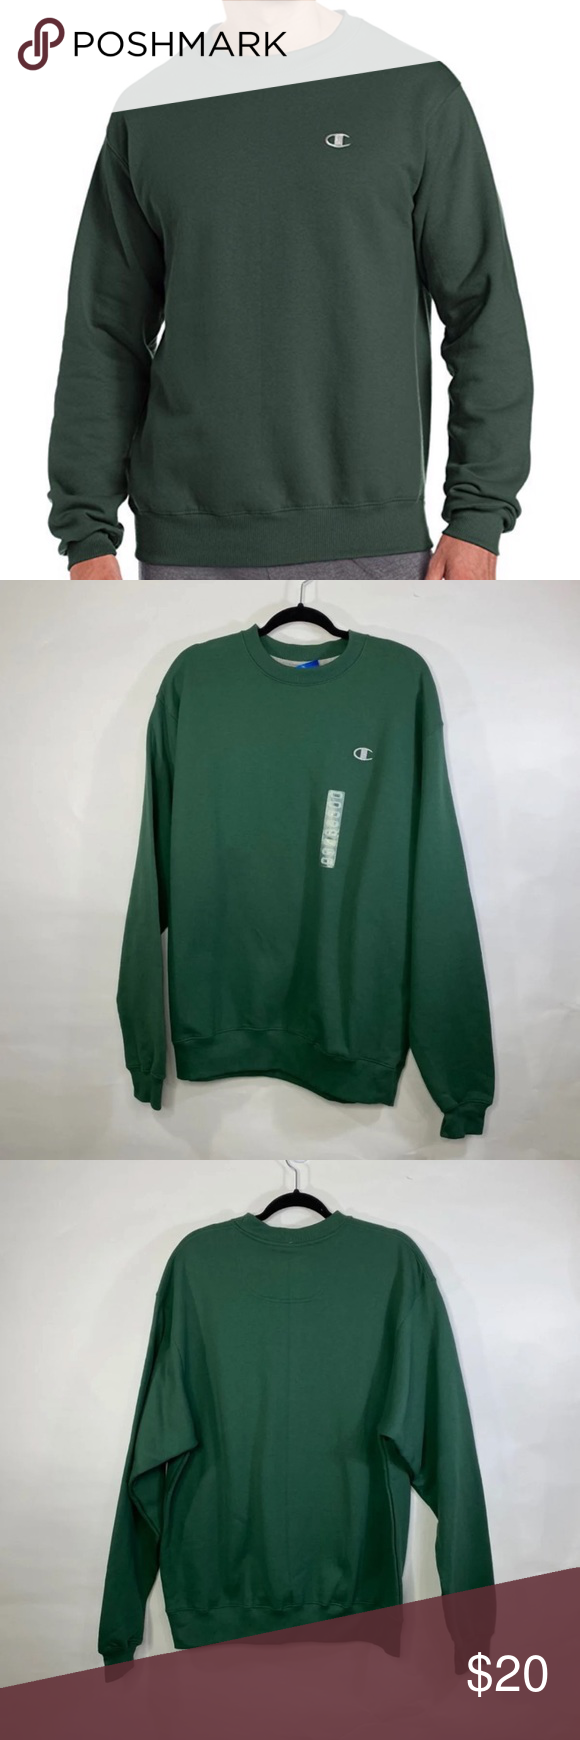 18 M Champion Nwt Eco Fleece Pullover Dark Green L Pullover Pullover Sweatshirts Fleece Pullover [ 1740 x 580 Pixel ]